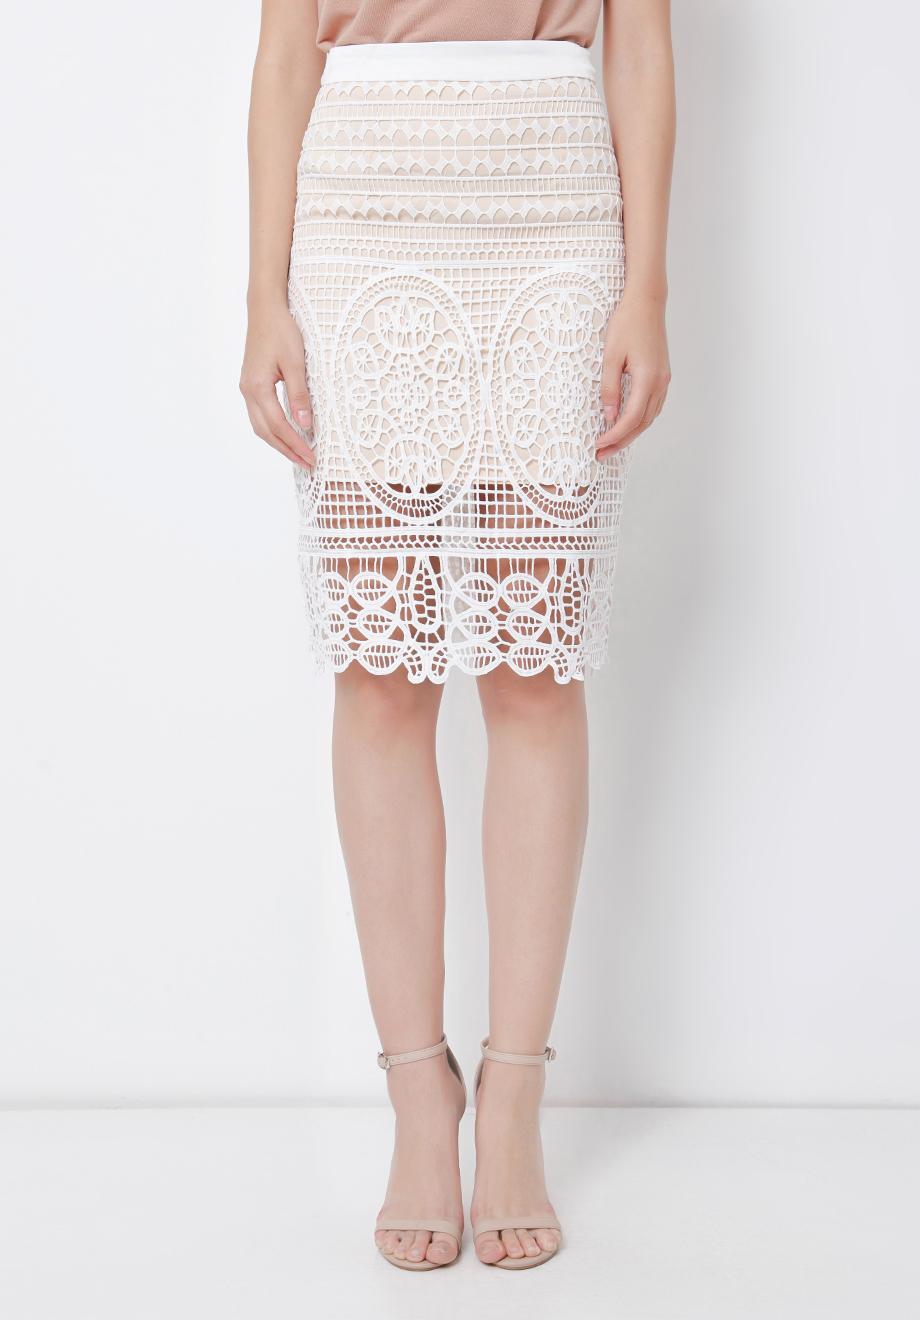 Chocochips Boutique Zelma Dress White Ruth Skirt